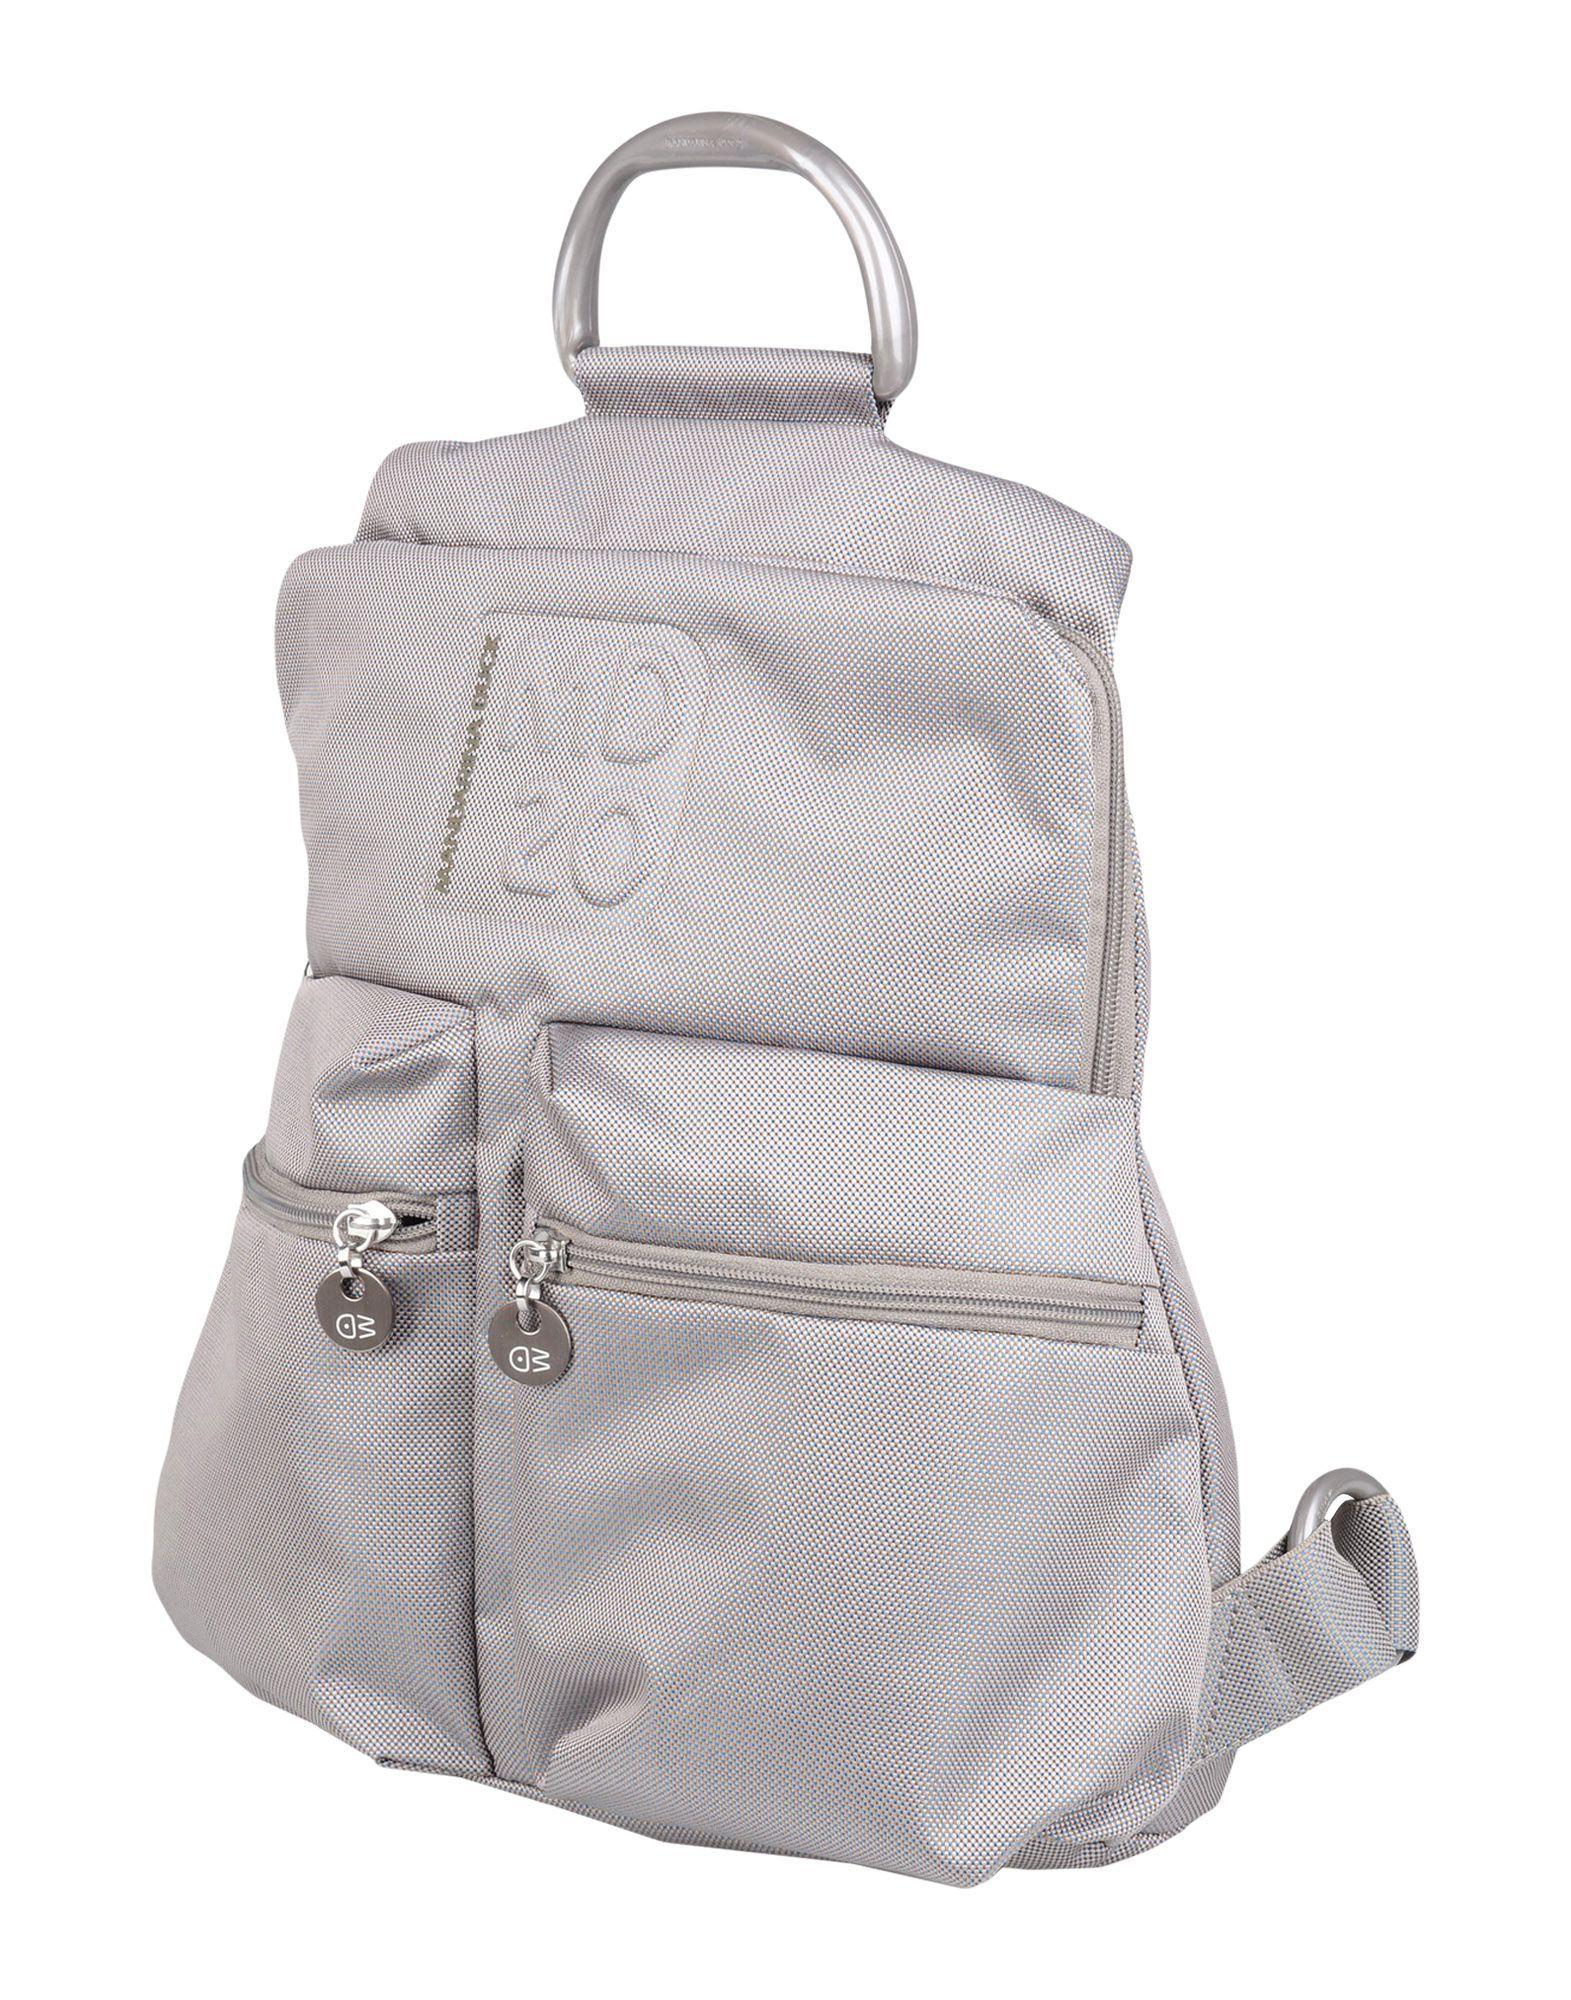 90602115c54b0 MANDARINA DUCK .  mandarinaduck  bags  polyester  backpacks ...